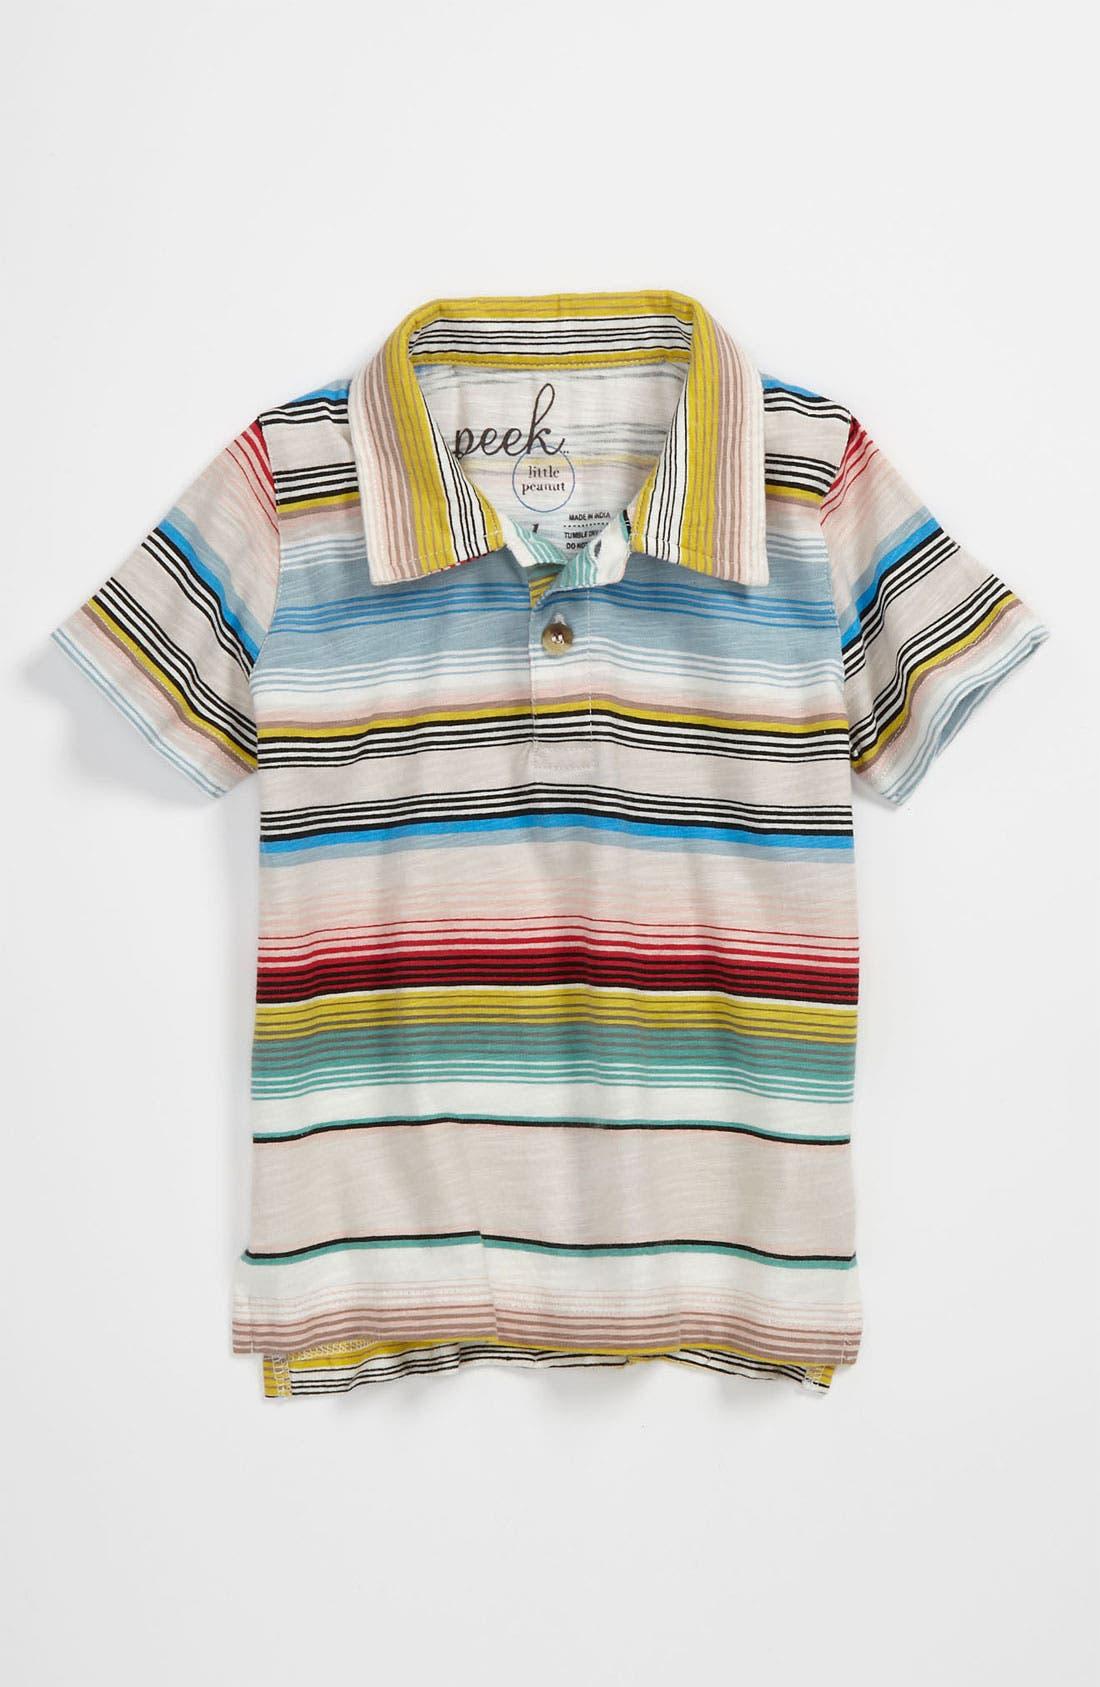 Main Image - Peek Stripe Polo Shirt (Baby)